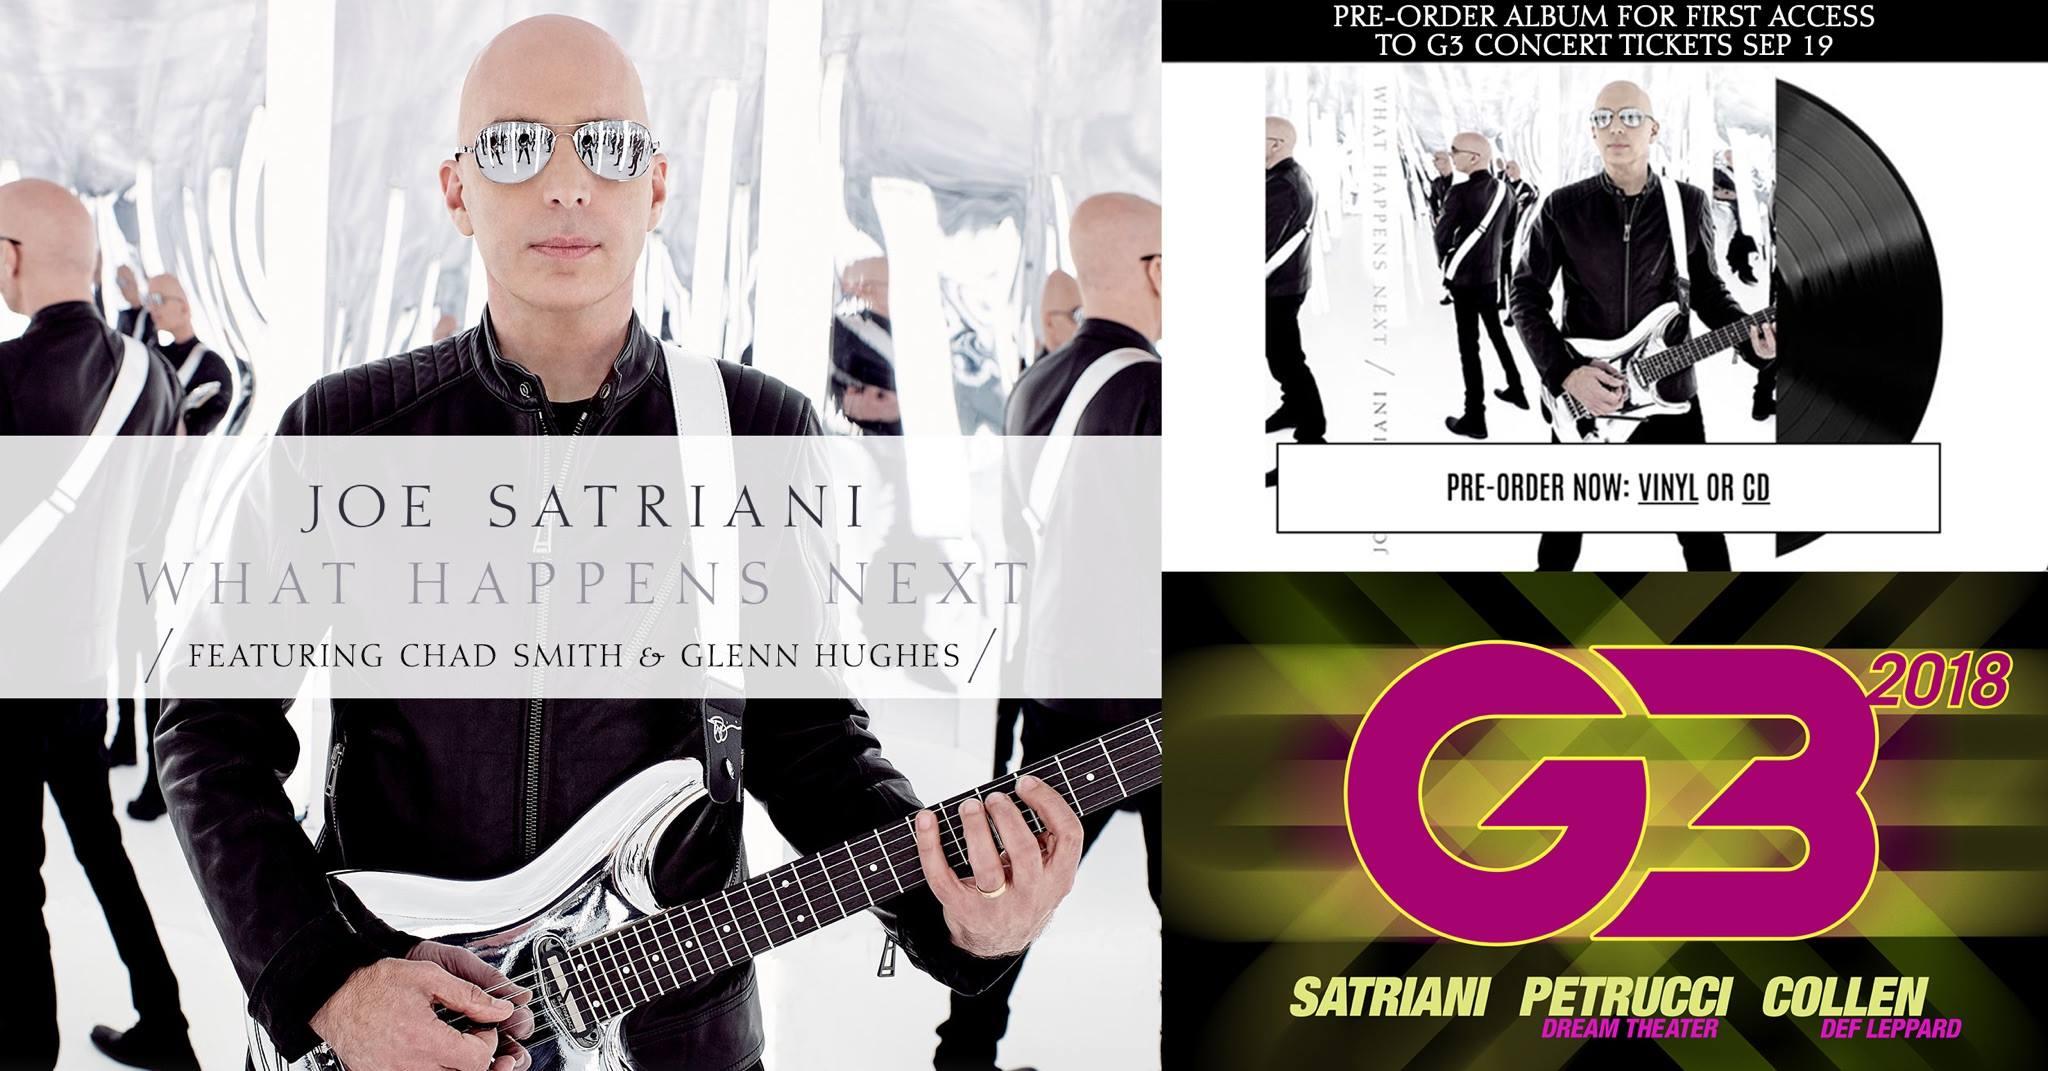 Joe Satriani announces new album and G3 tour with Petrucci and Collen